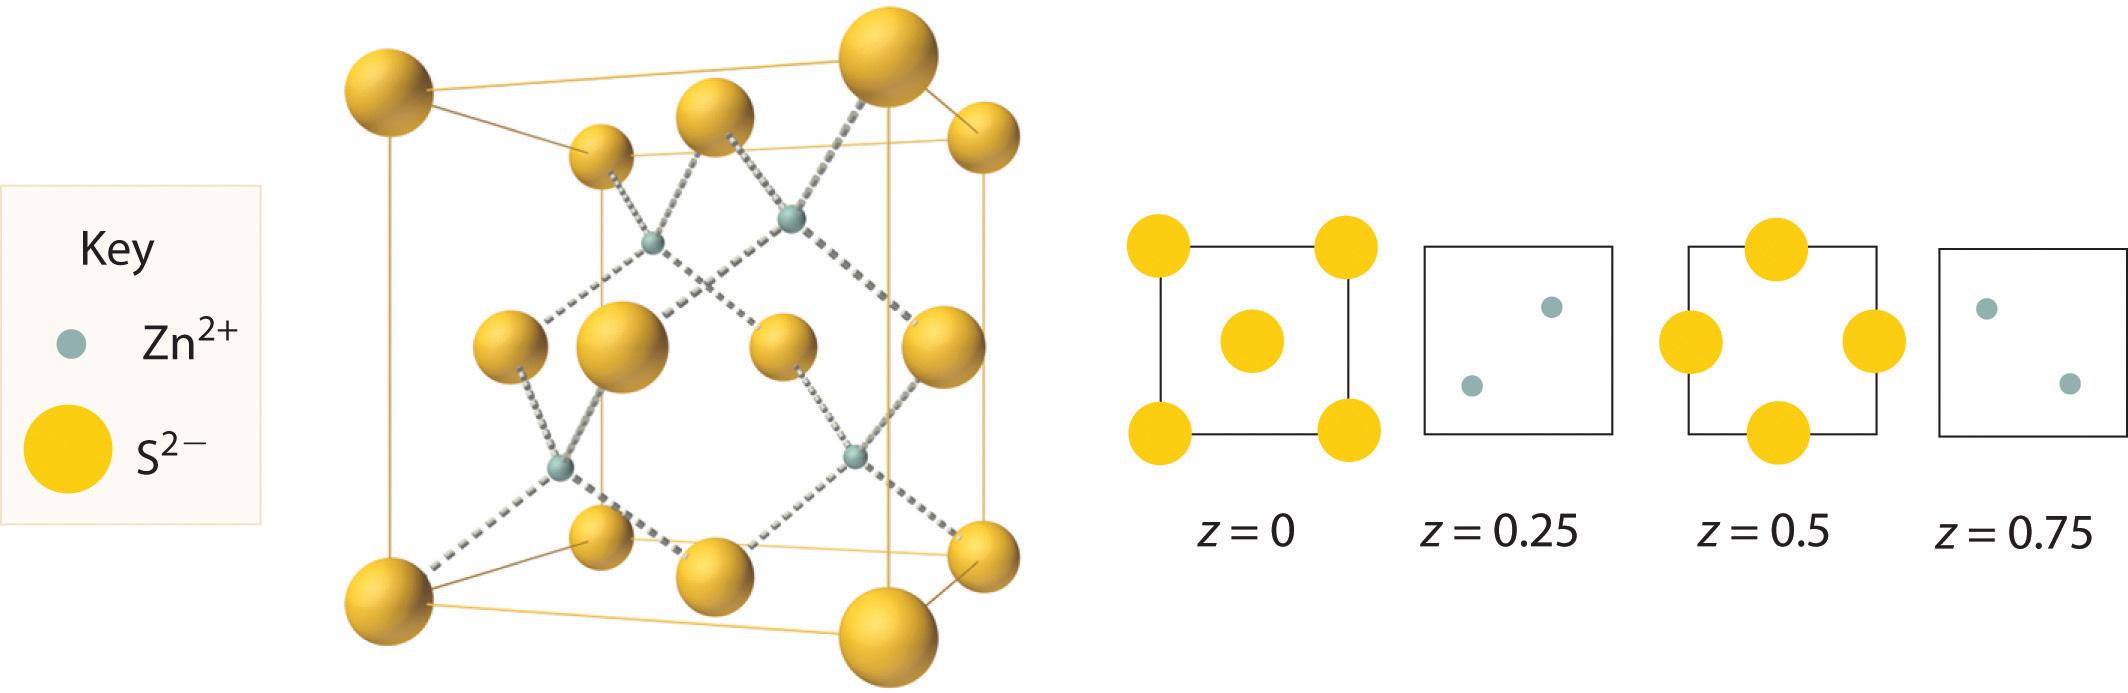 Carbon dot diagram for zinc product wiring diagrams 00ecb07828f299c134552d4ff7fb1d36 jpg rh academic csc edu aluminum dot diagram zinc energy level diagram ccuart Choice Image